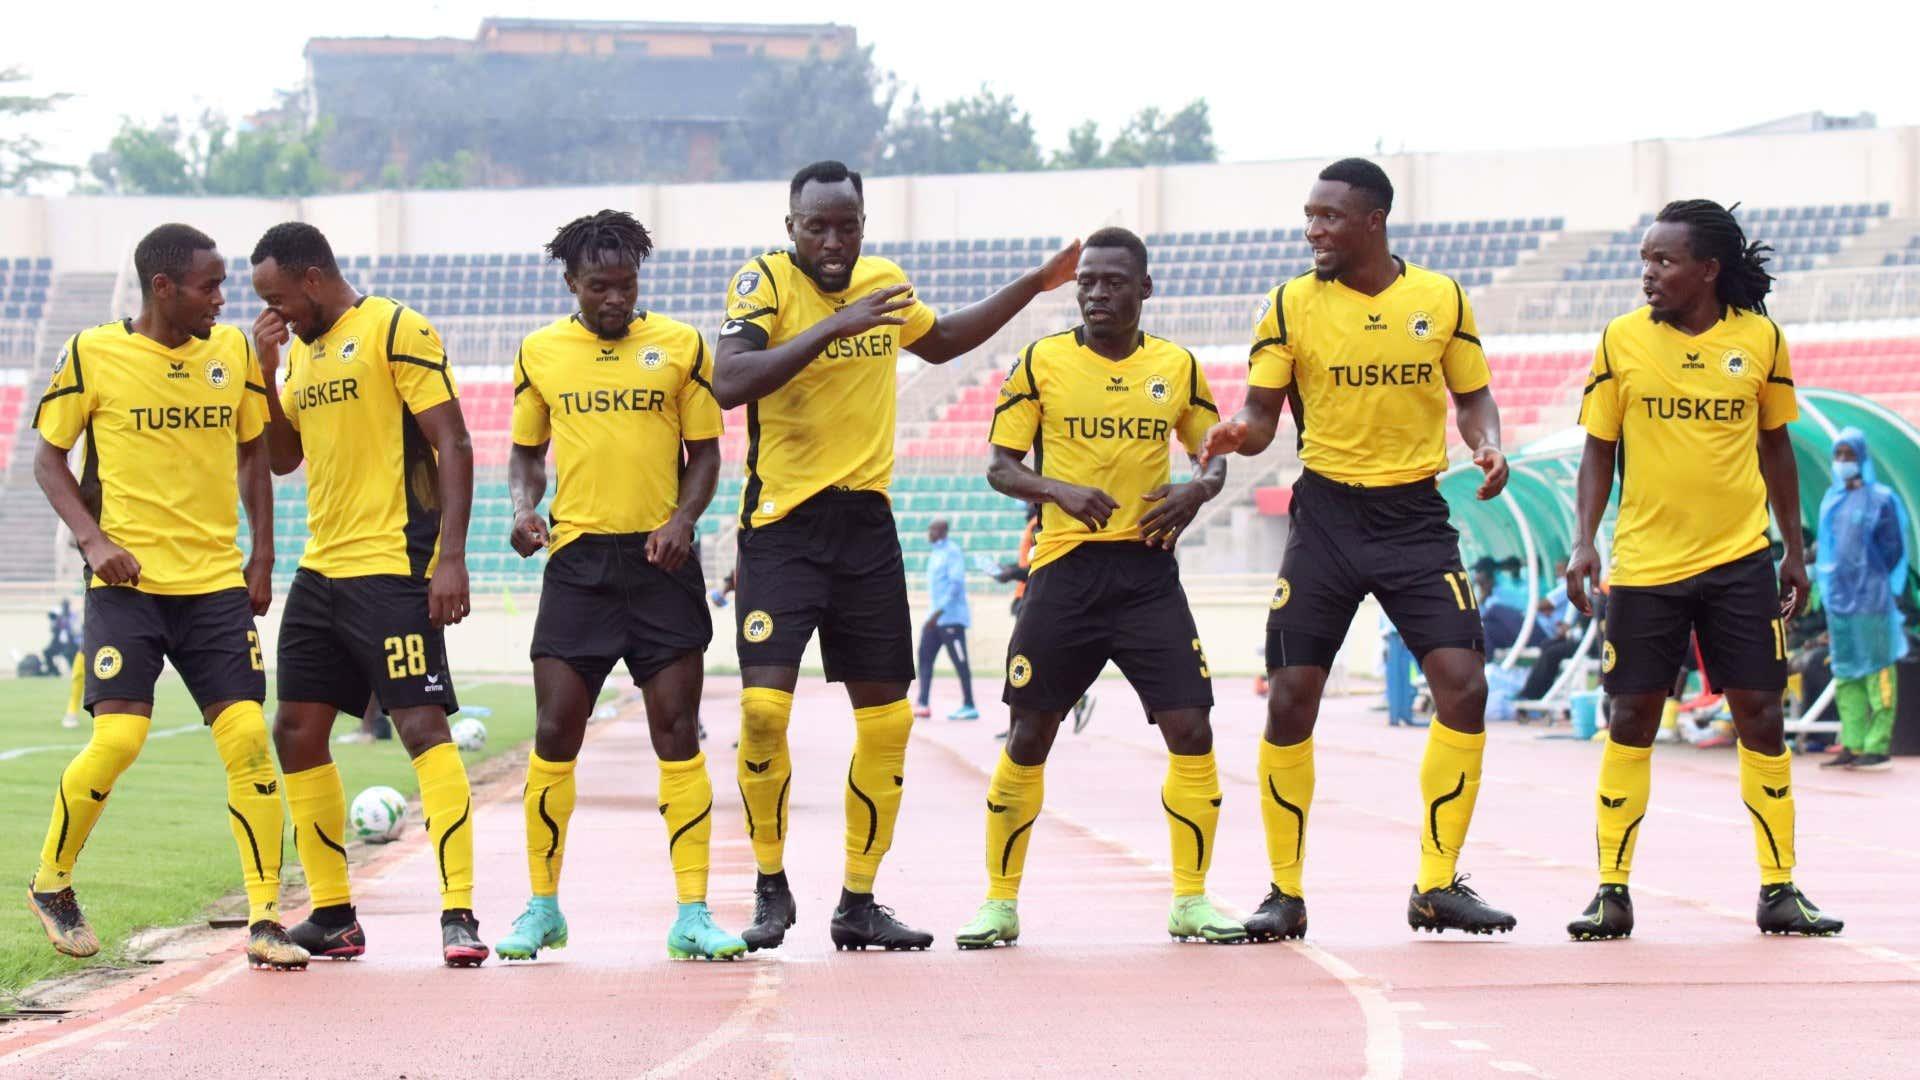 Caf Champions League: 'Tusker must make Kenya proud' – Matano